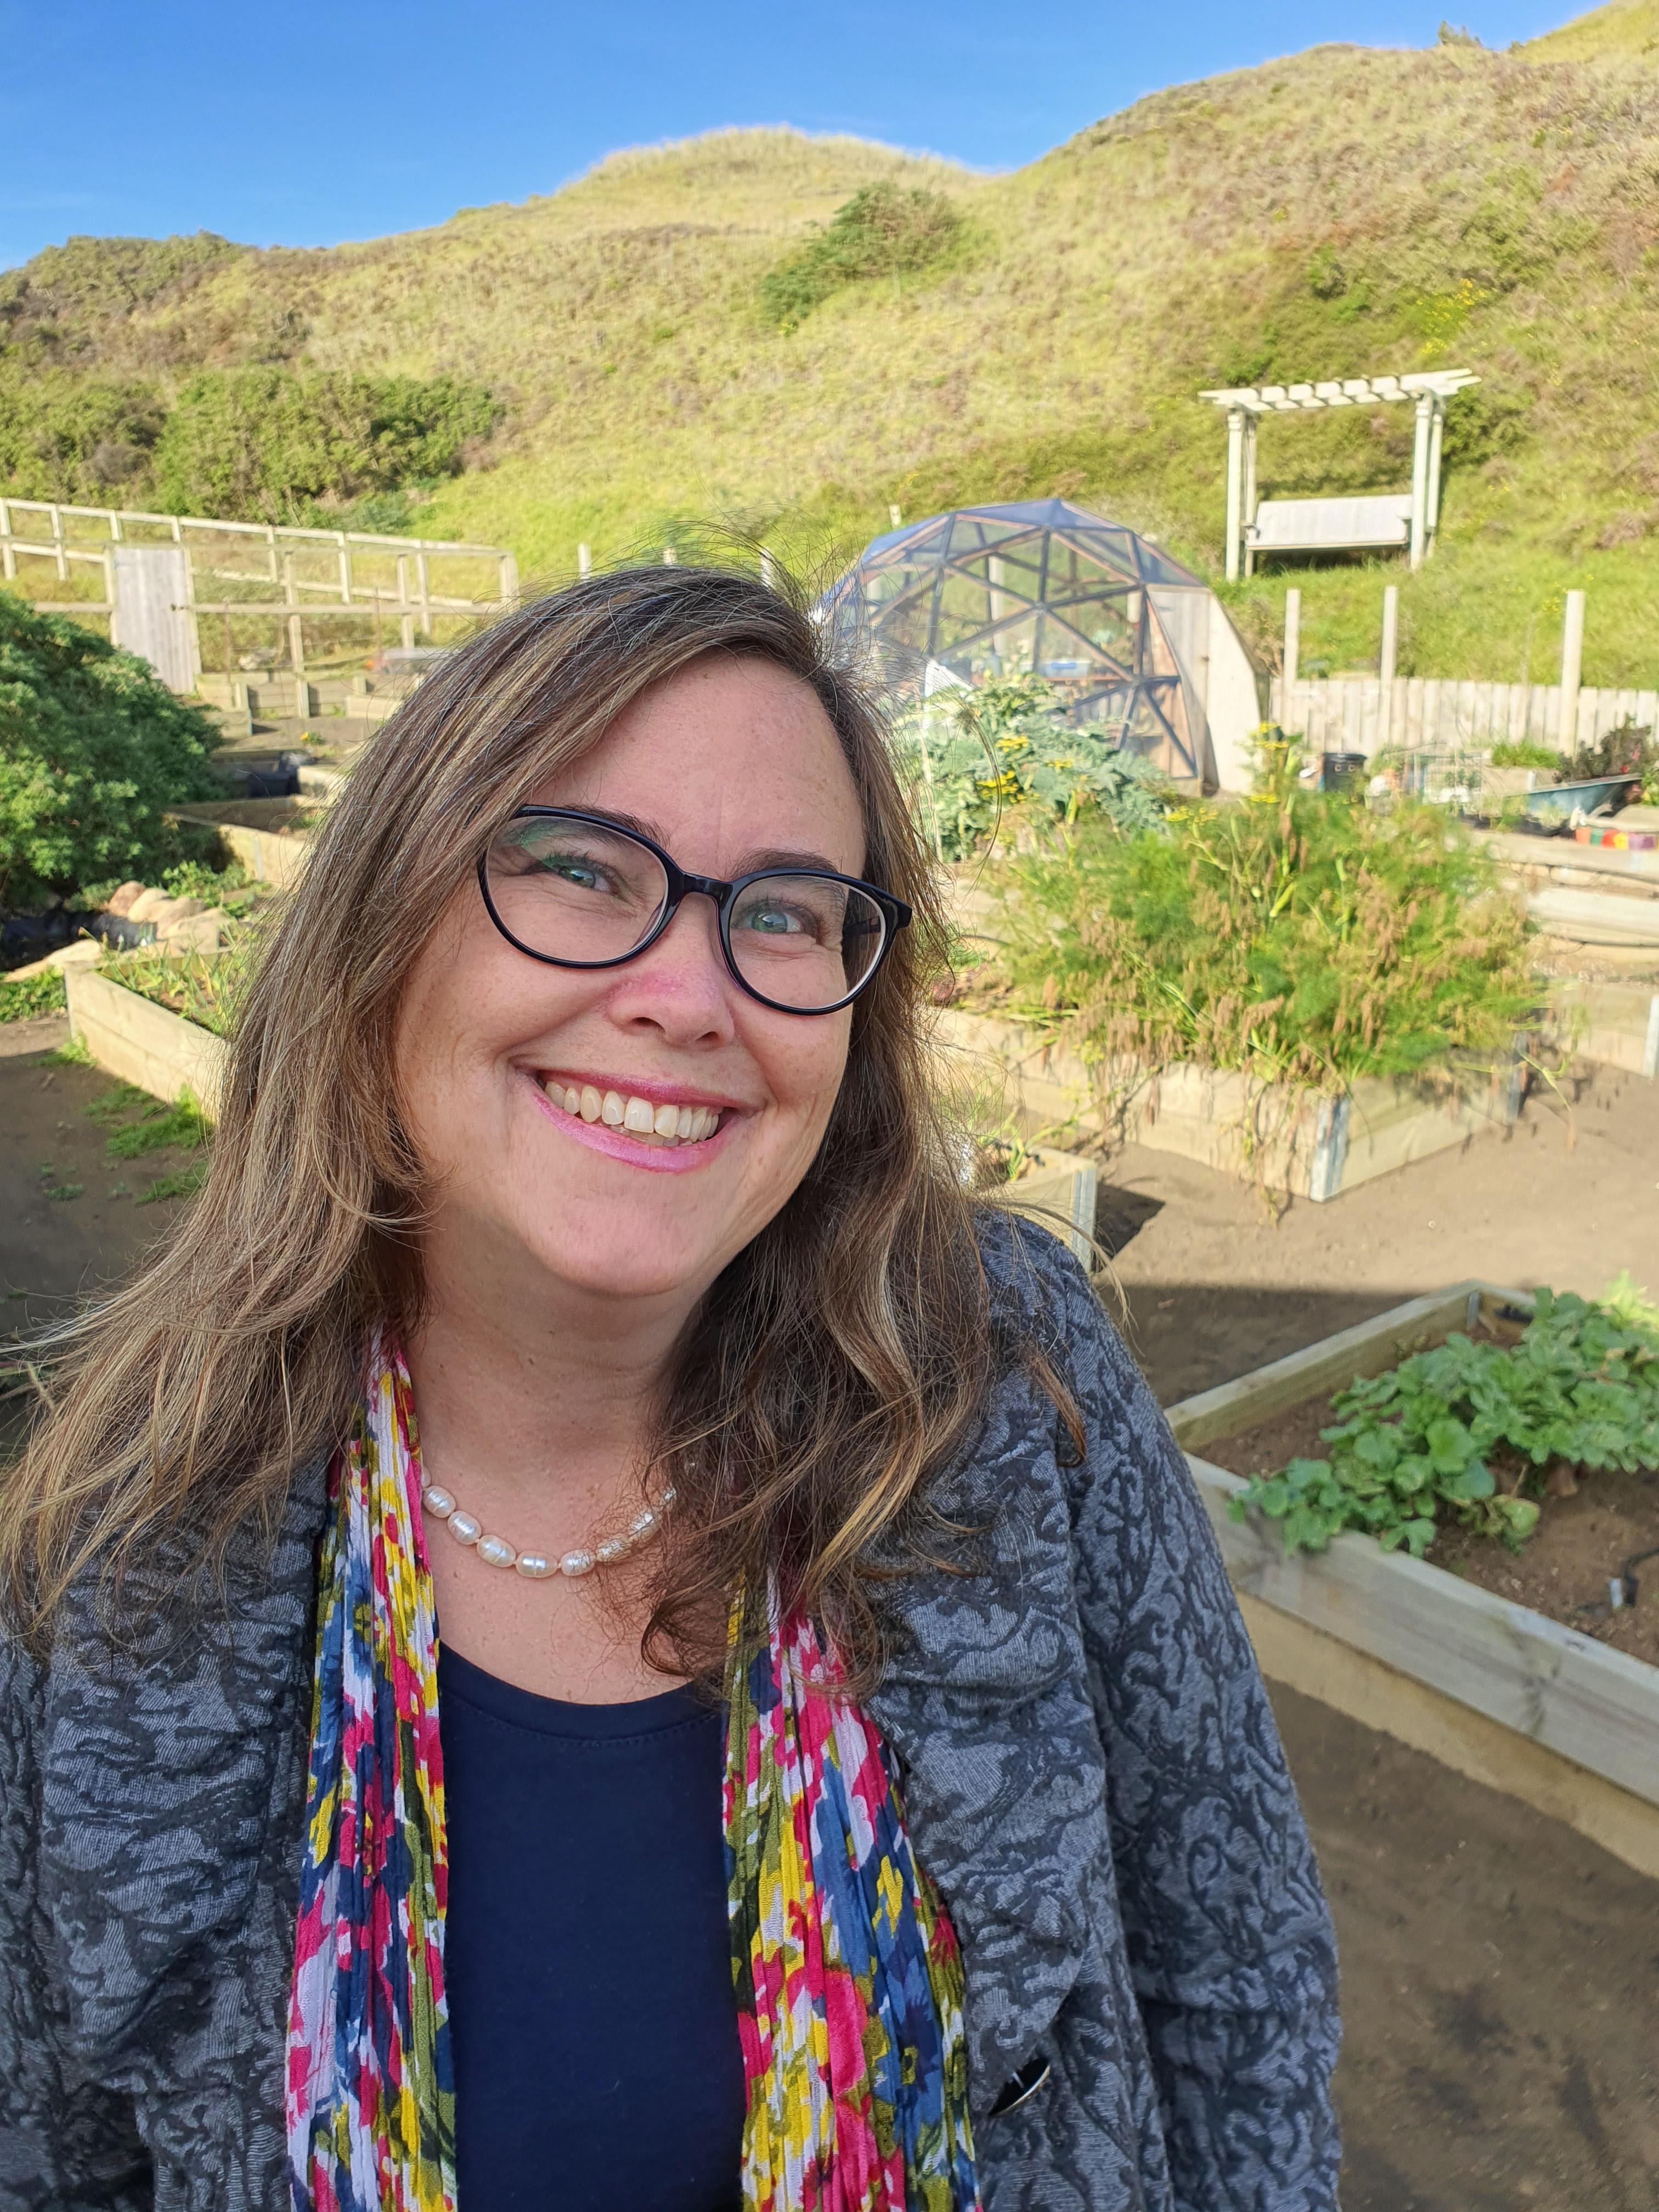 Sarah the Gardener